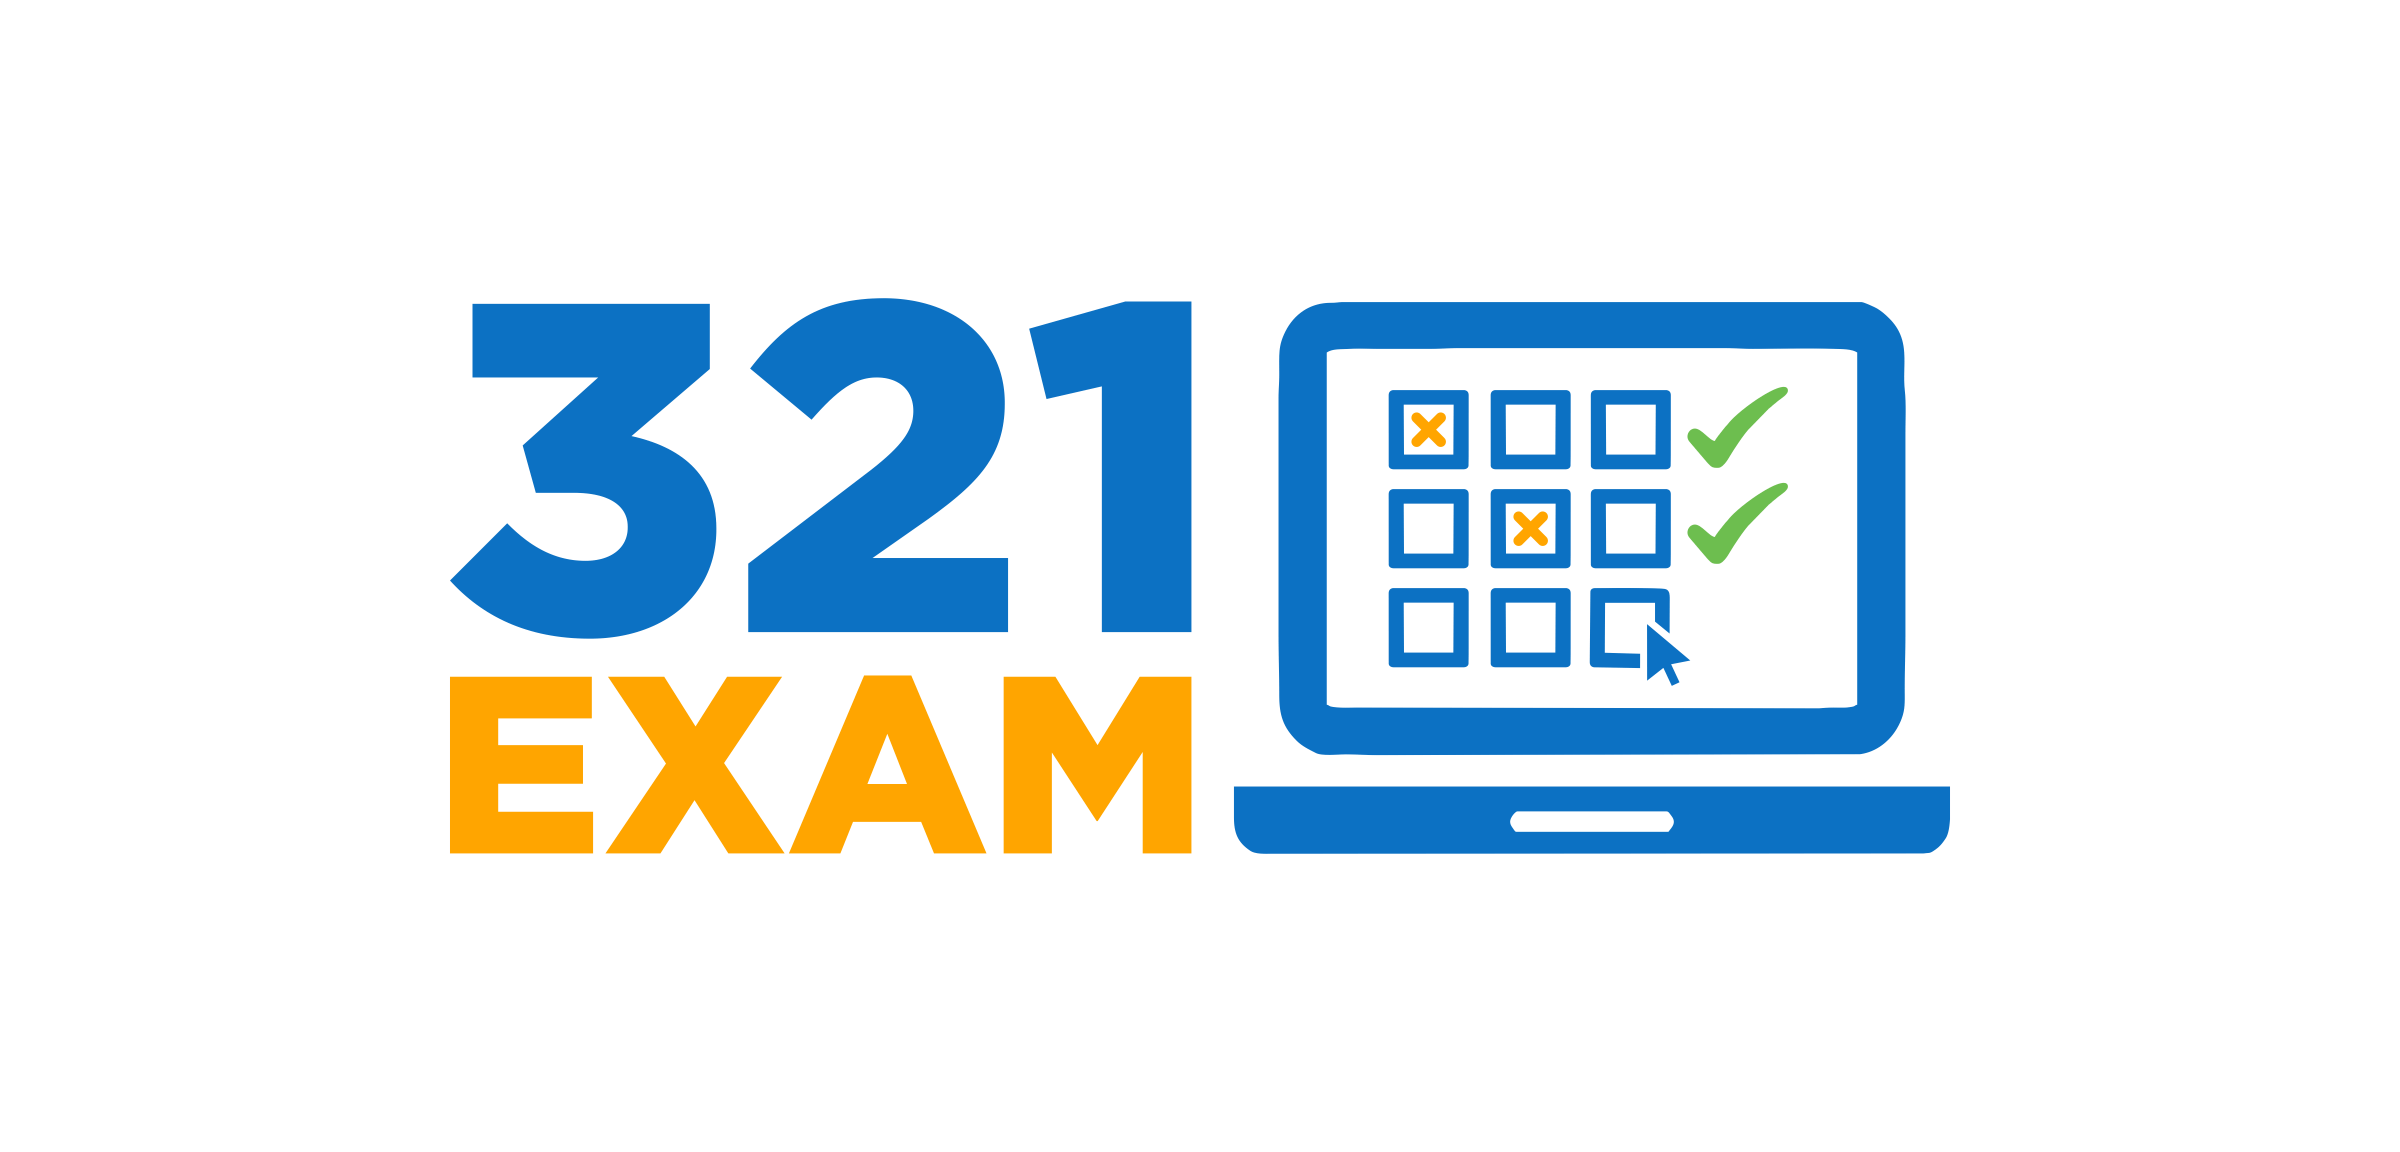 321Exam